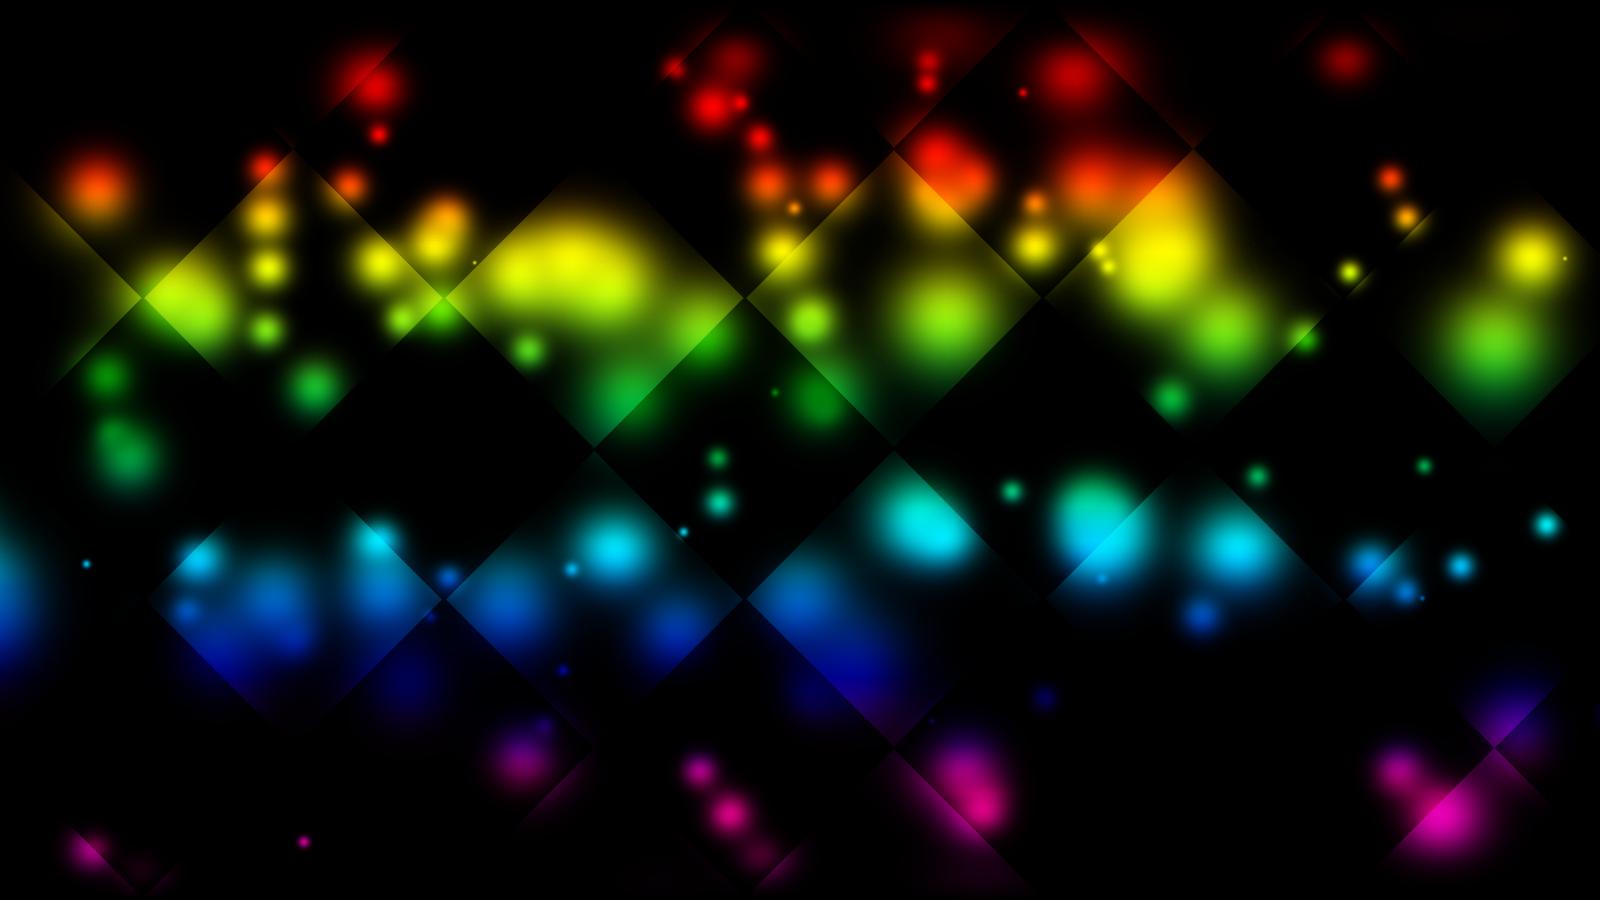 Rainbow Checkers Background